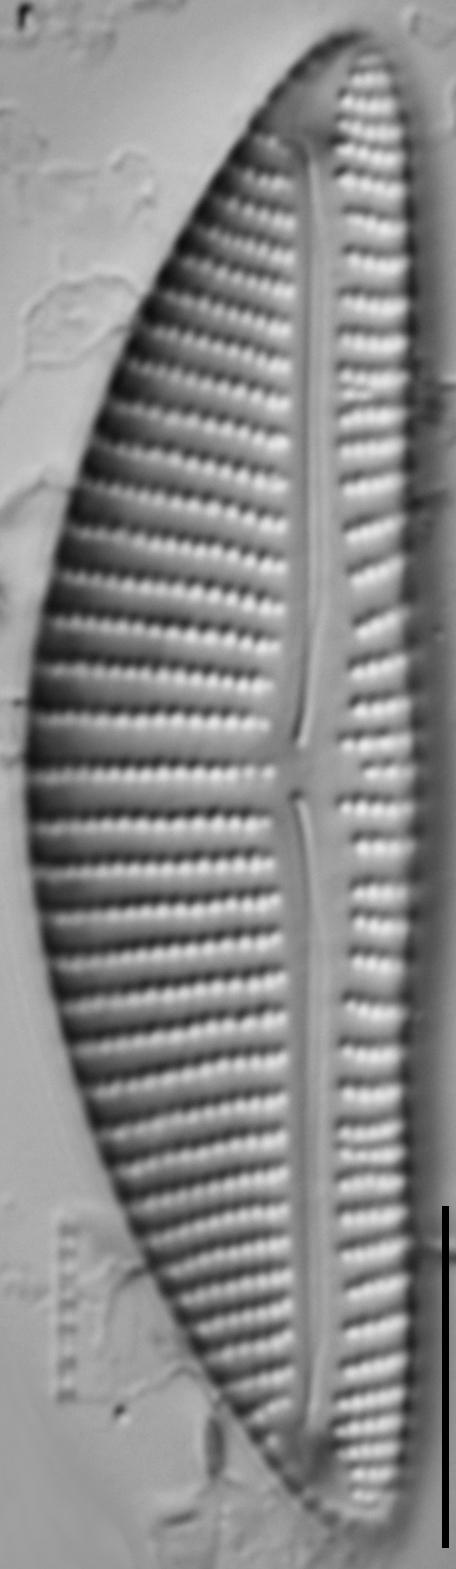 Encyonema minutum var pseudogracilis LM5